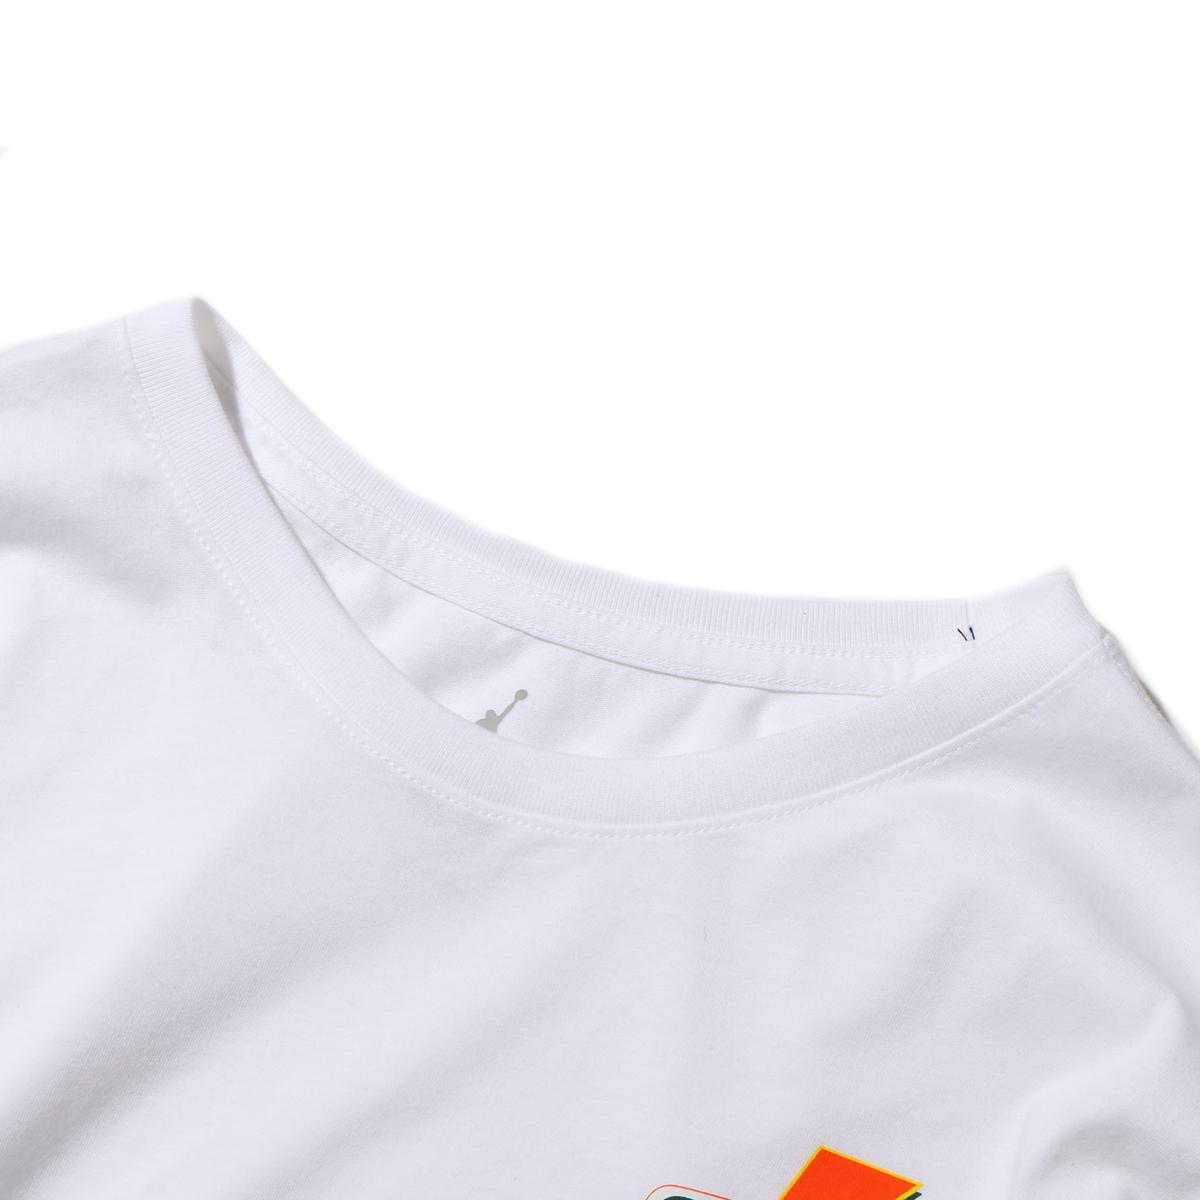 1fc21f7fb464 NIKE M JSW LS TEE BE LIKE MIKE VRBG (Nike Jordan like microphone Burbage  Longus Reeve T-shirt) (WHITE) 17HO-S